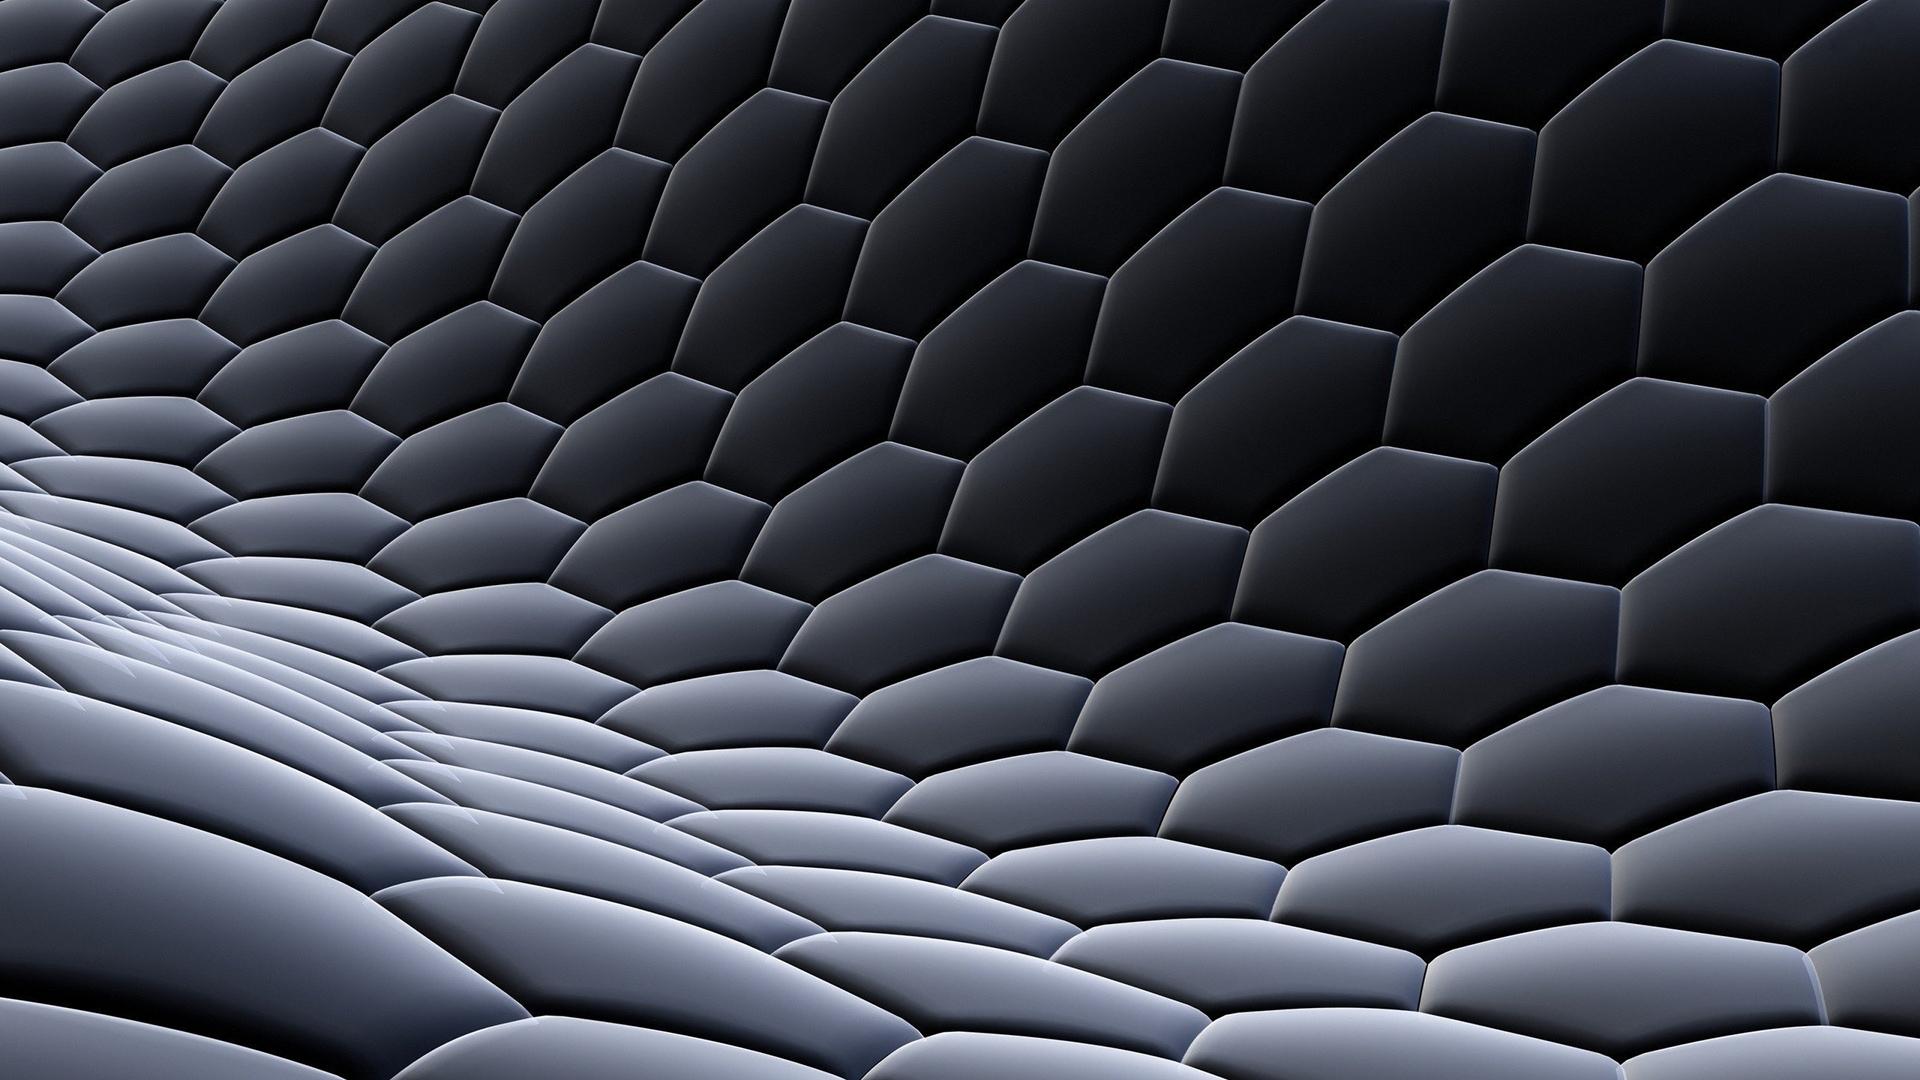 hexagon hd wallpaper background image 1920x1080 id